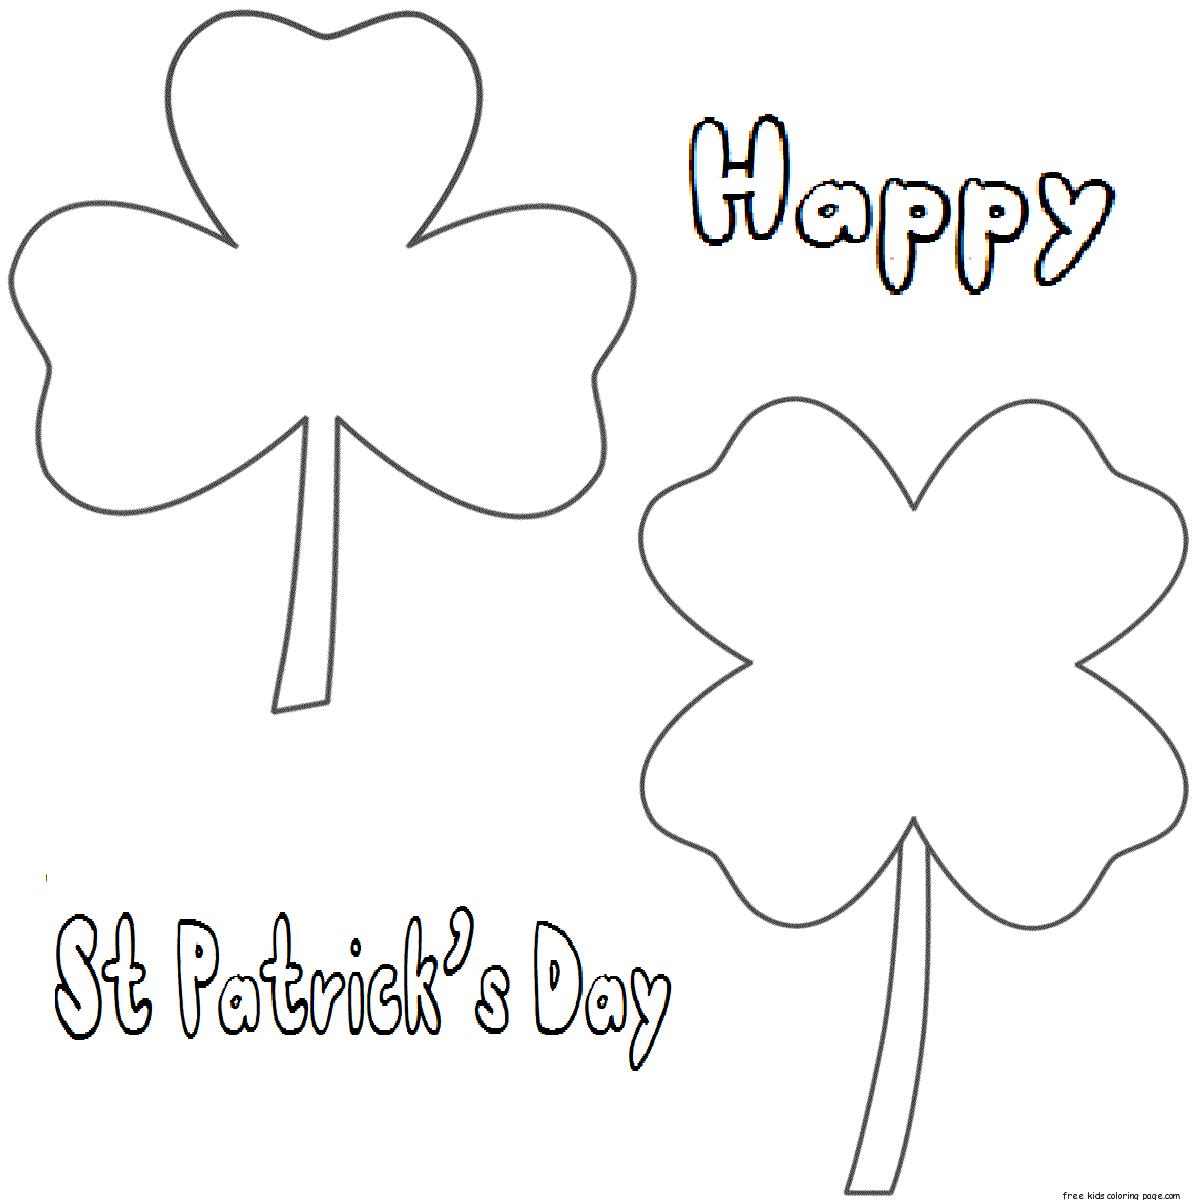 Printable three leaf clover coloring